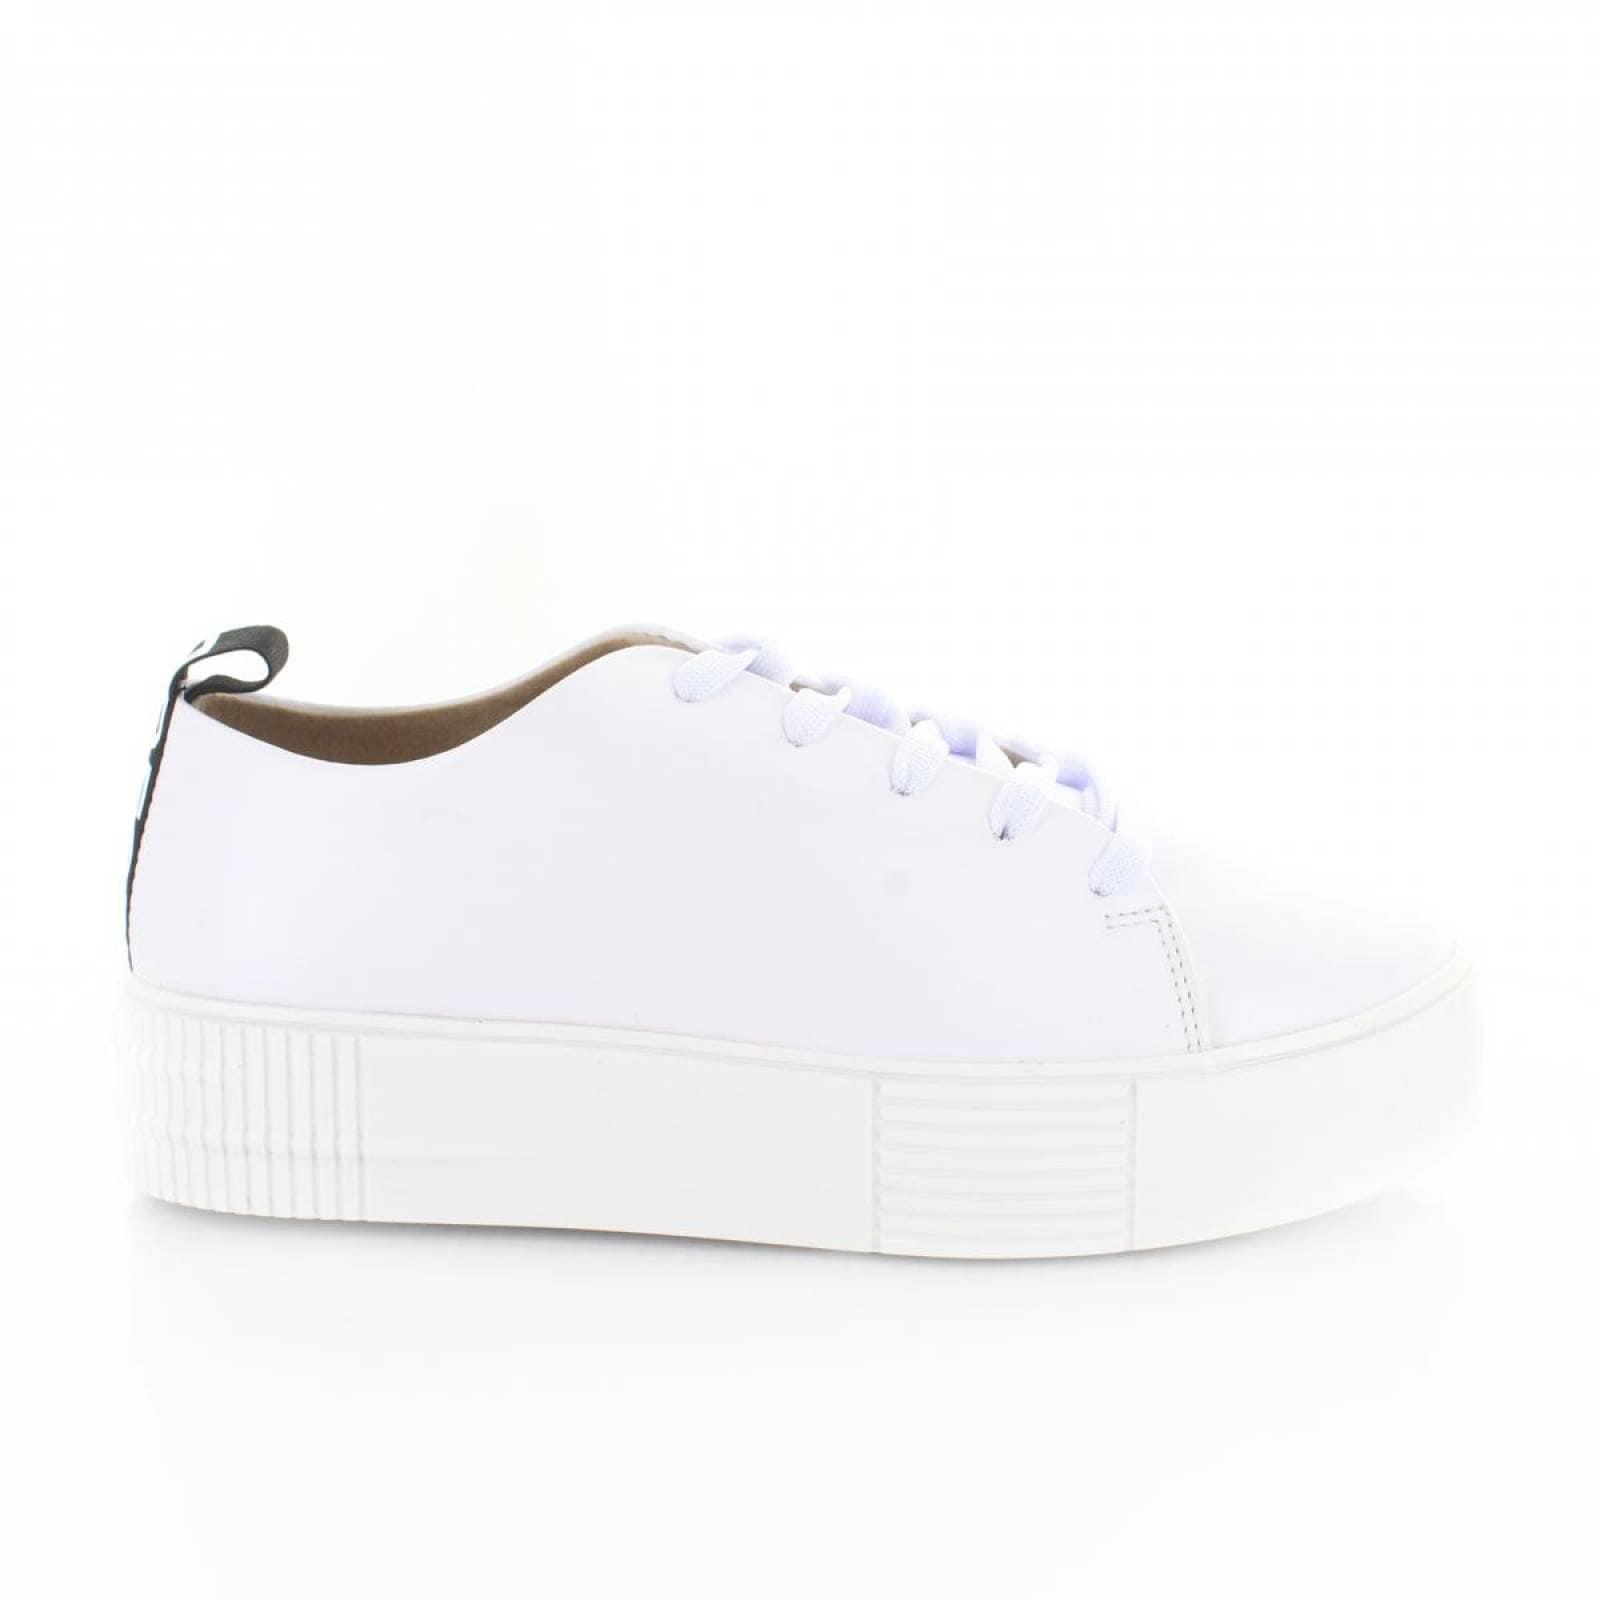 Tenis para Mujer Brantano 4553 049776 Color Blanco